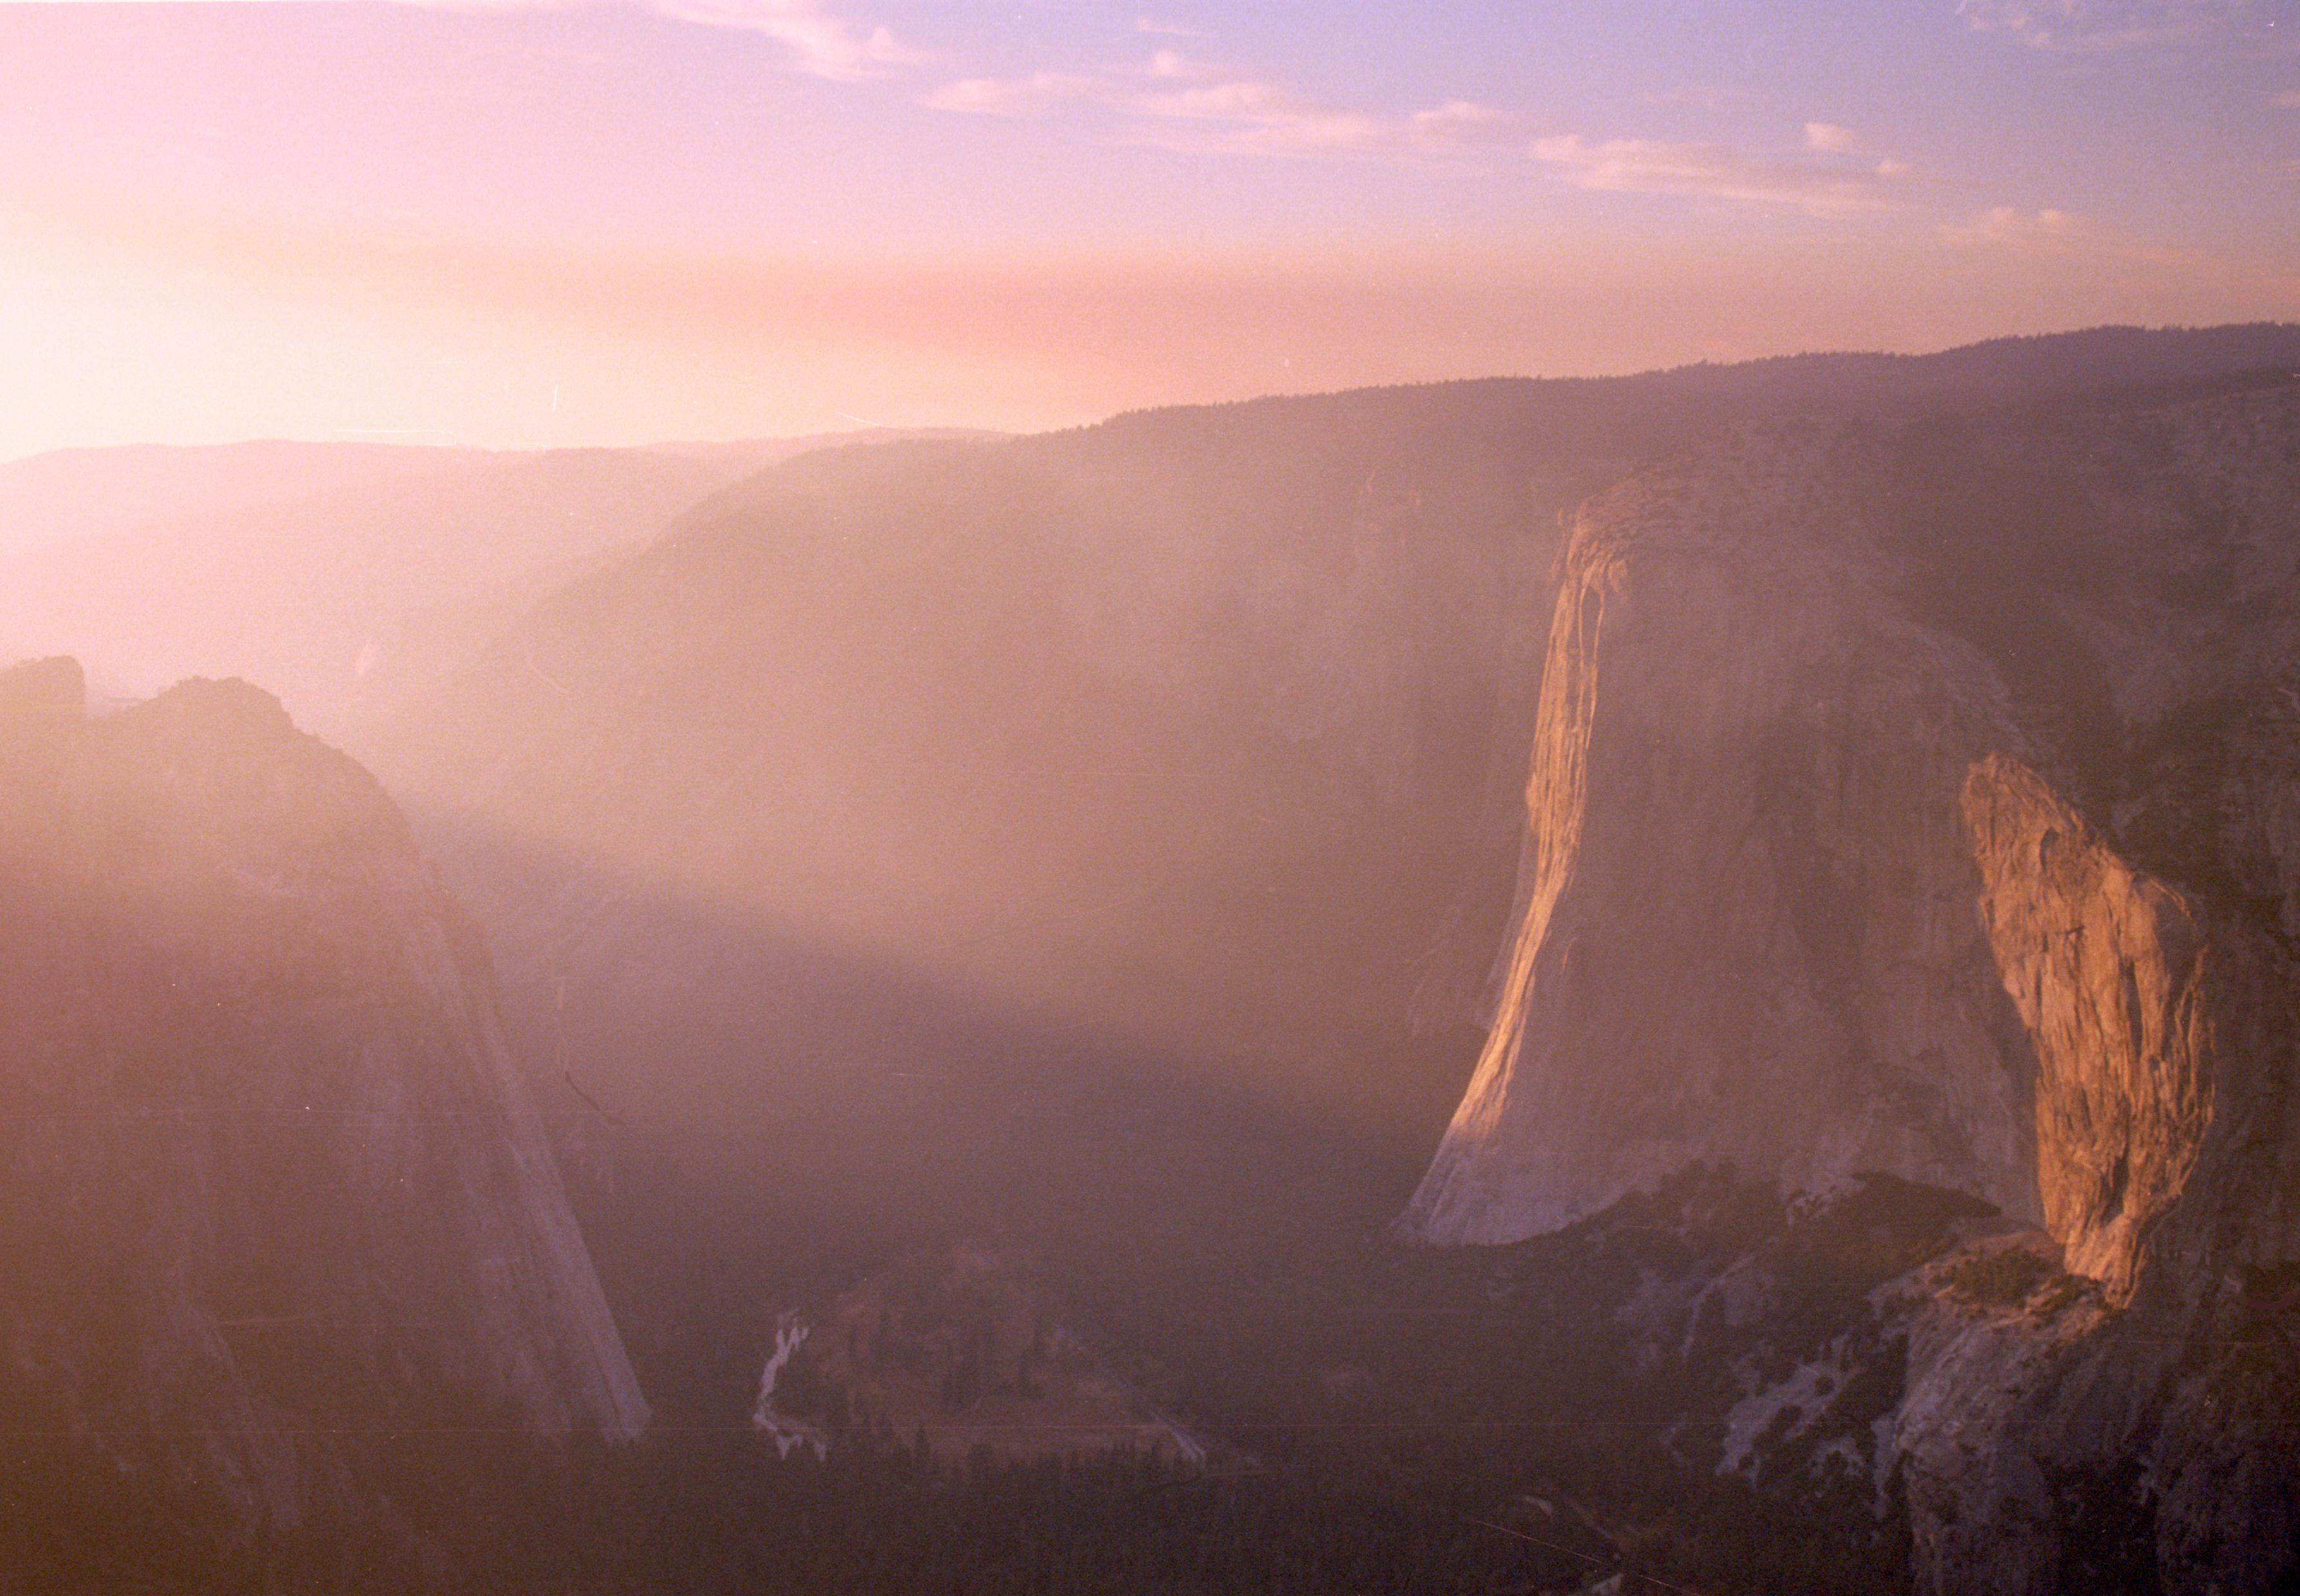 Trad and Big Wall Free Climbing | The Rock Climber's ...